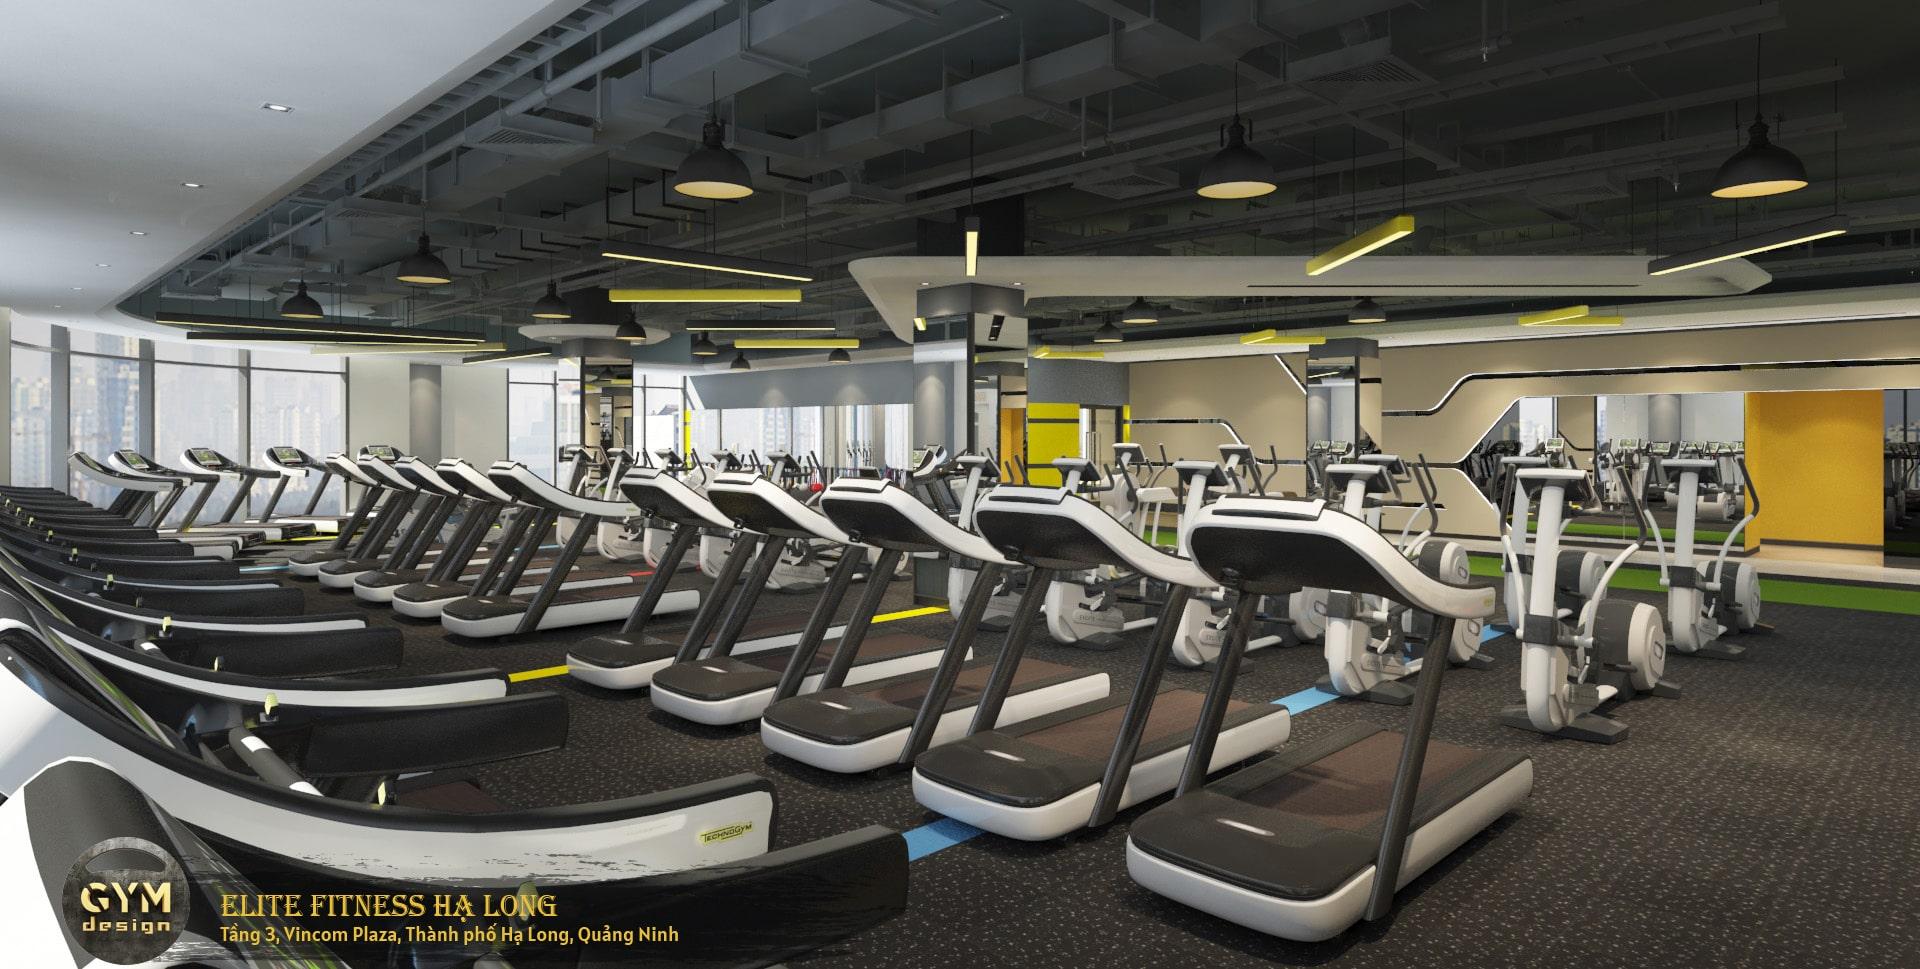 thiet-ke-phong-gym-elite-fitness-ha-long-41